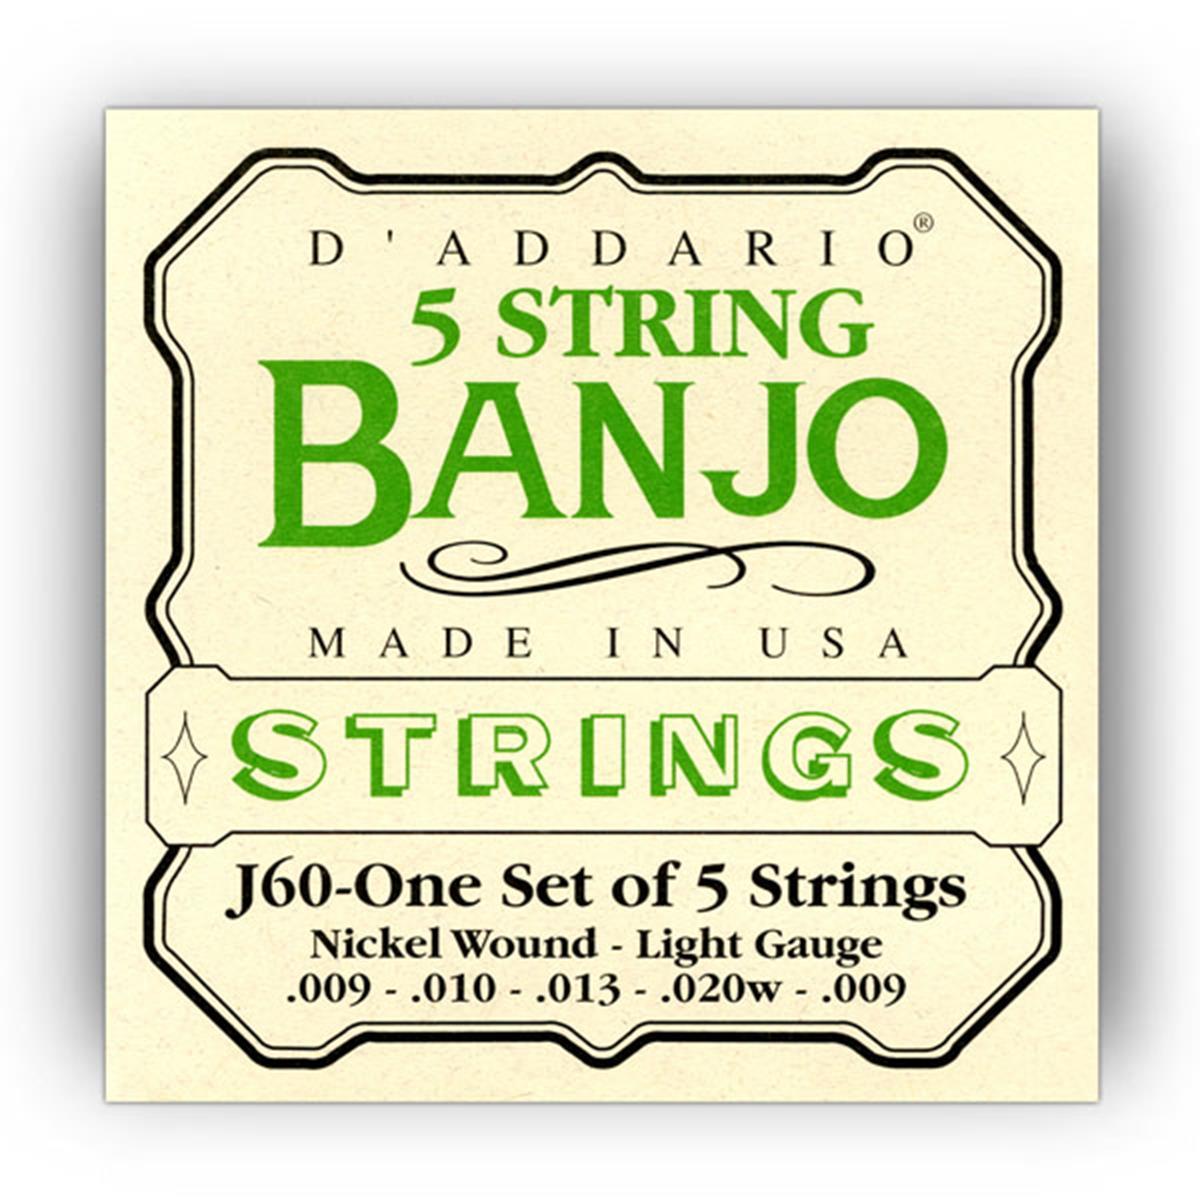 D'ADDARIO J60 5 STRING BANJO MUTA